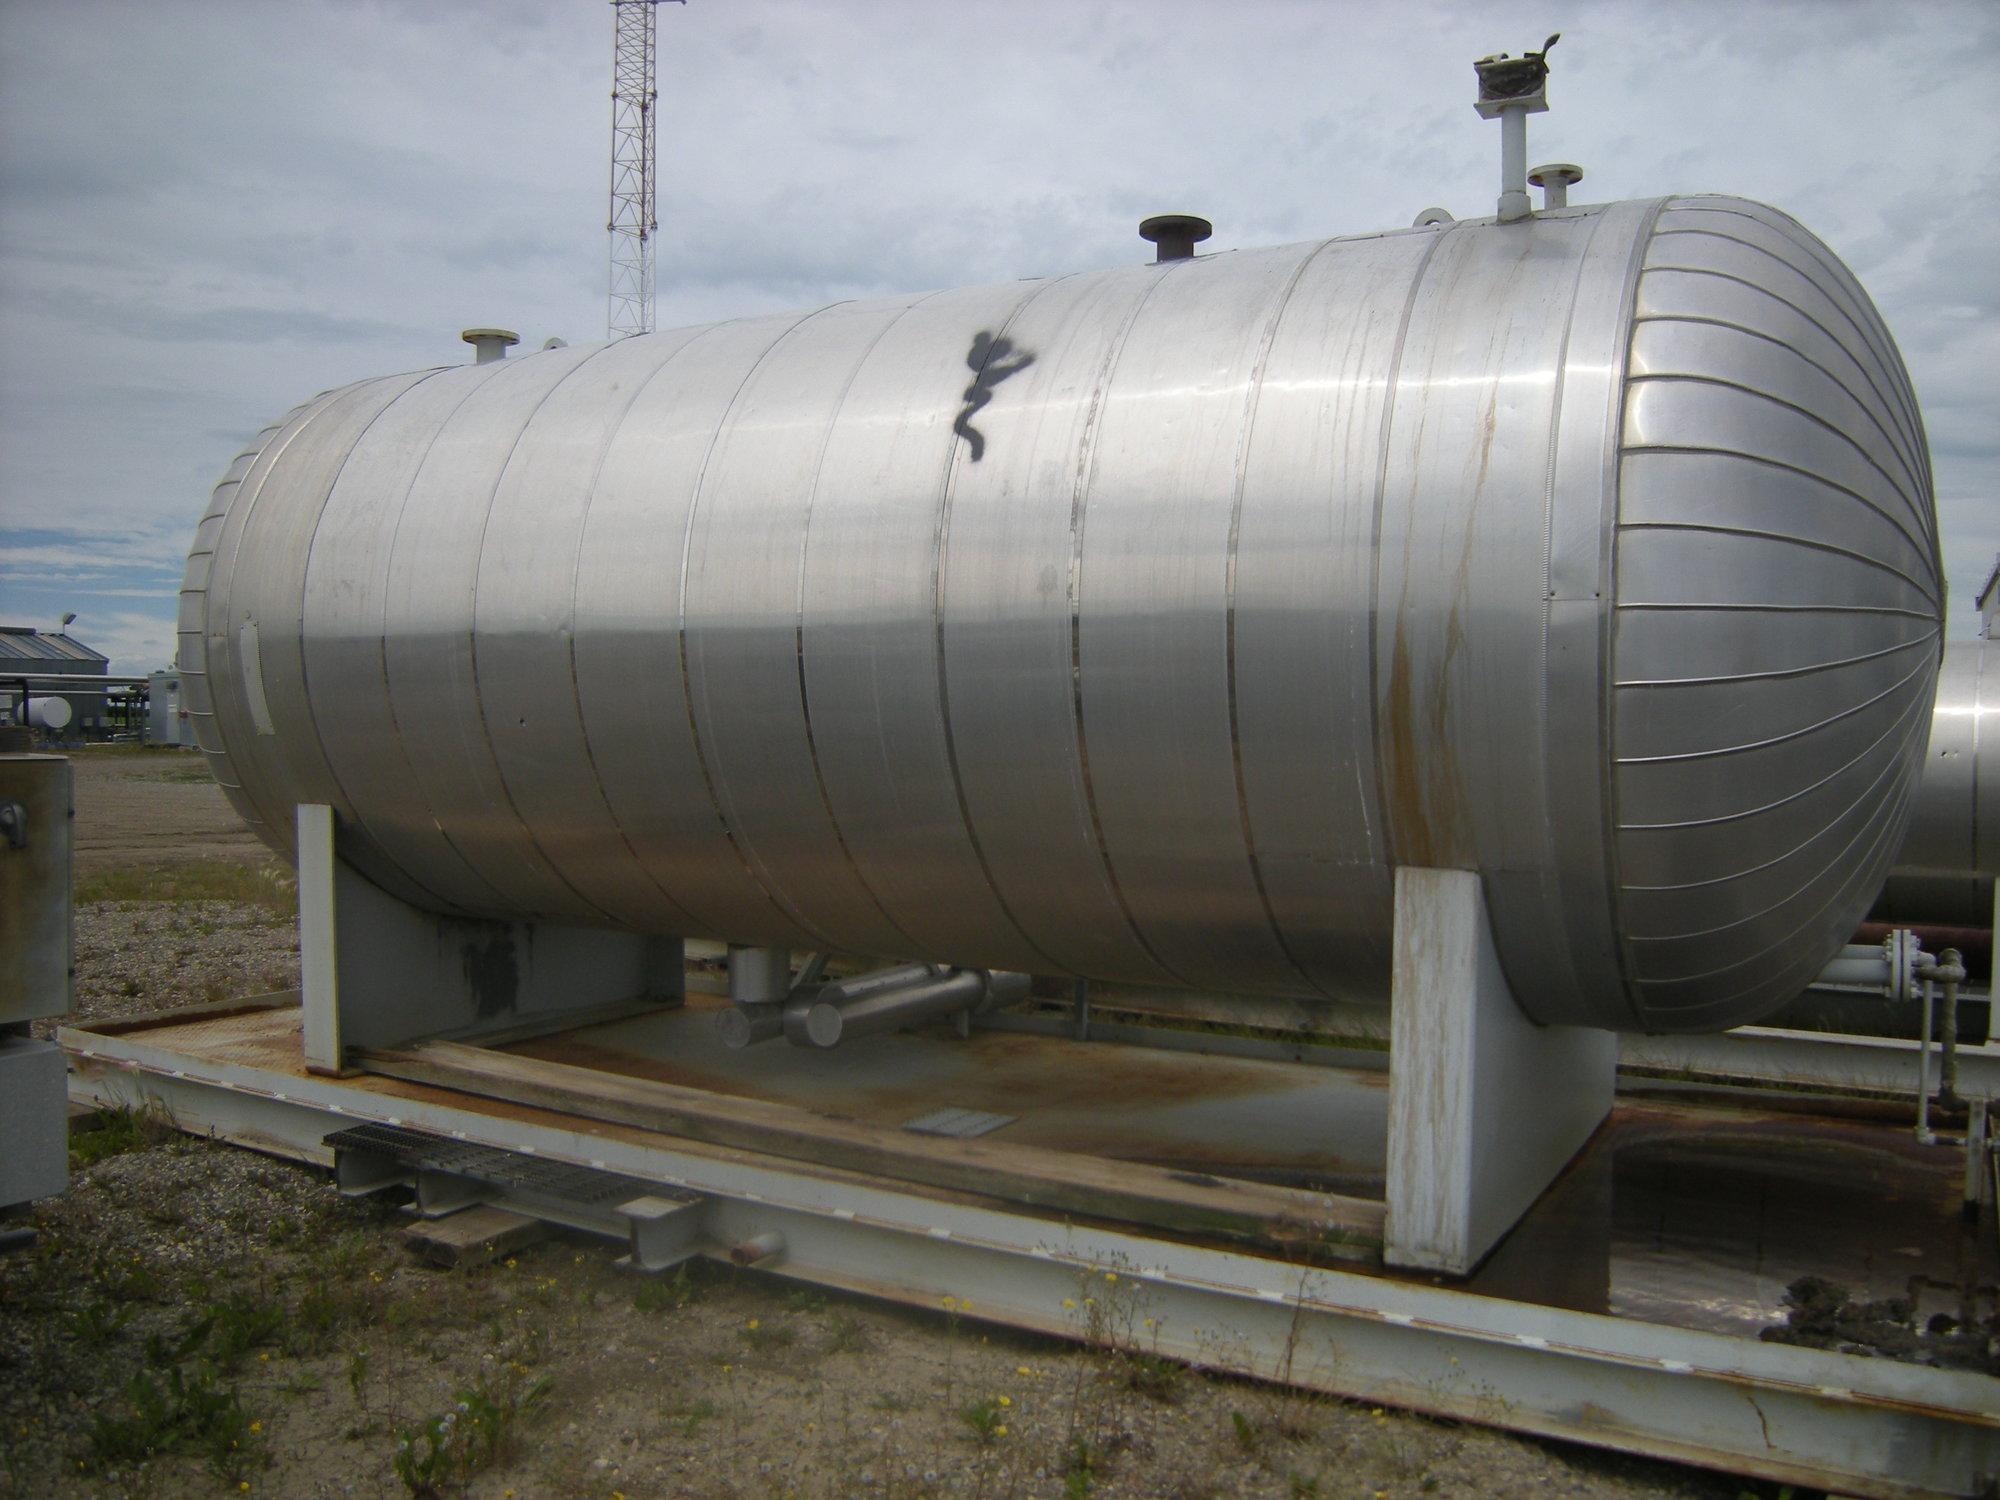 storagetank - 200 bbl